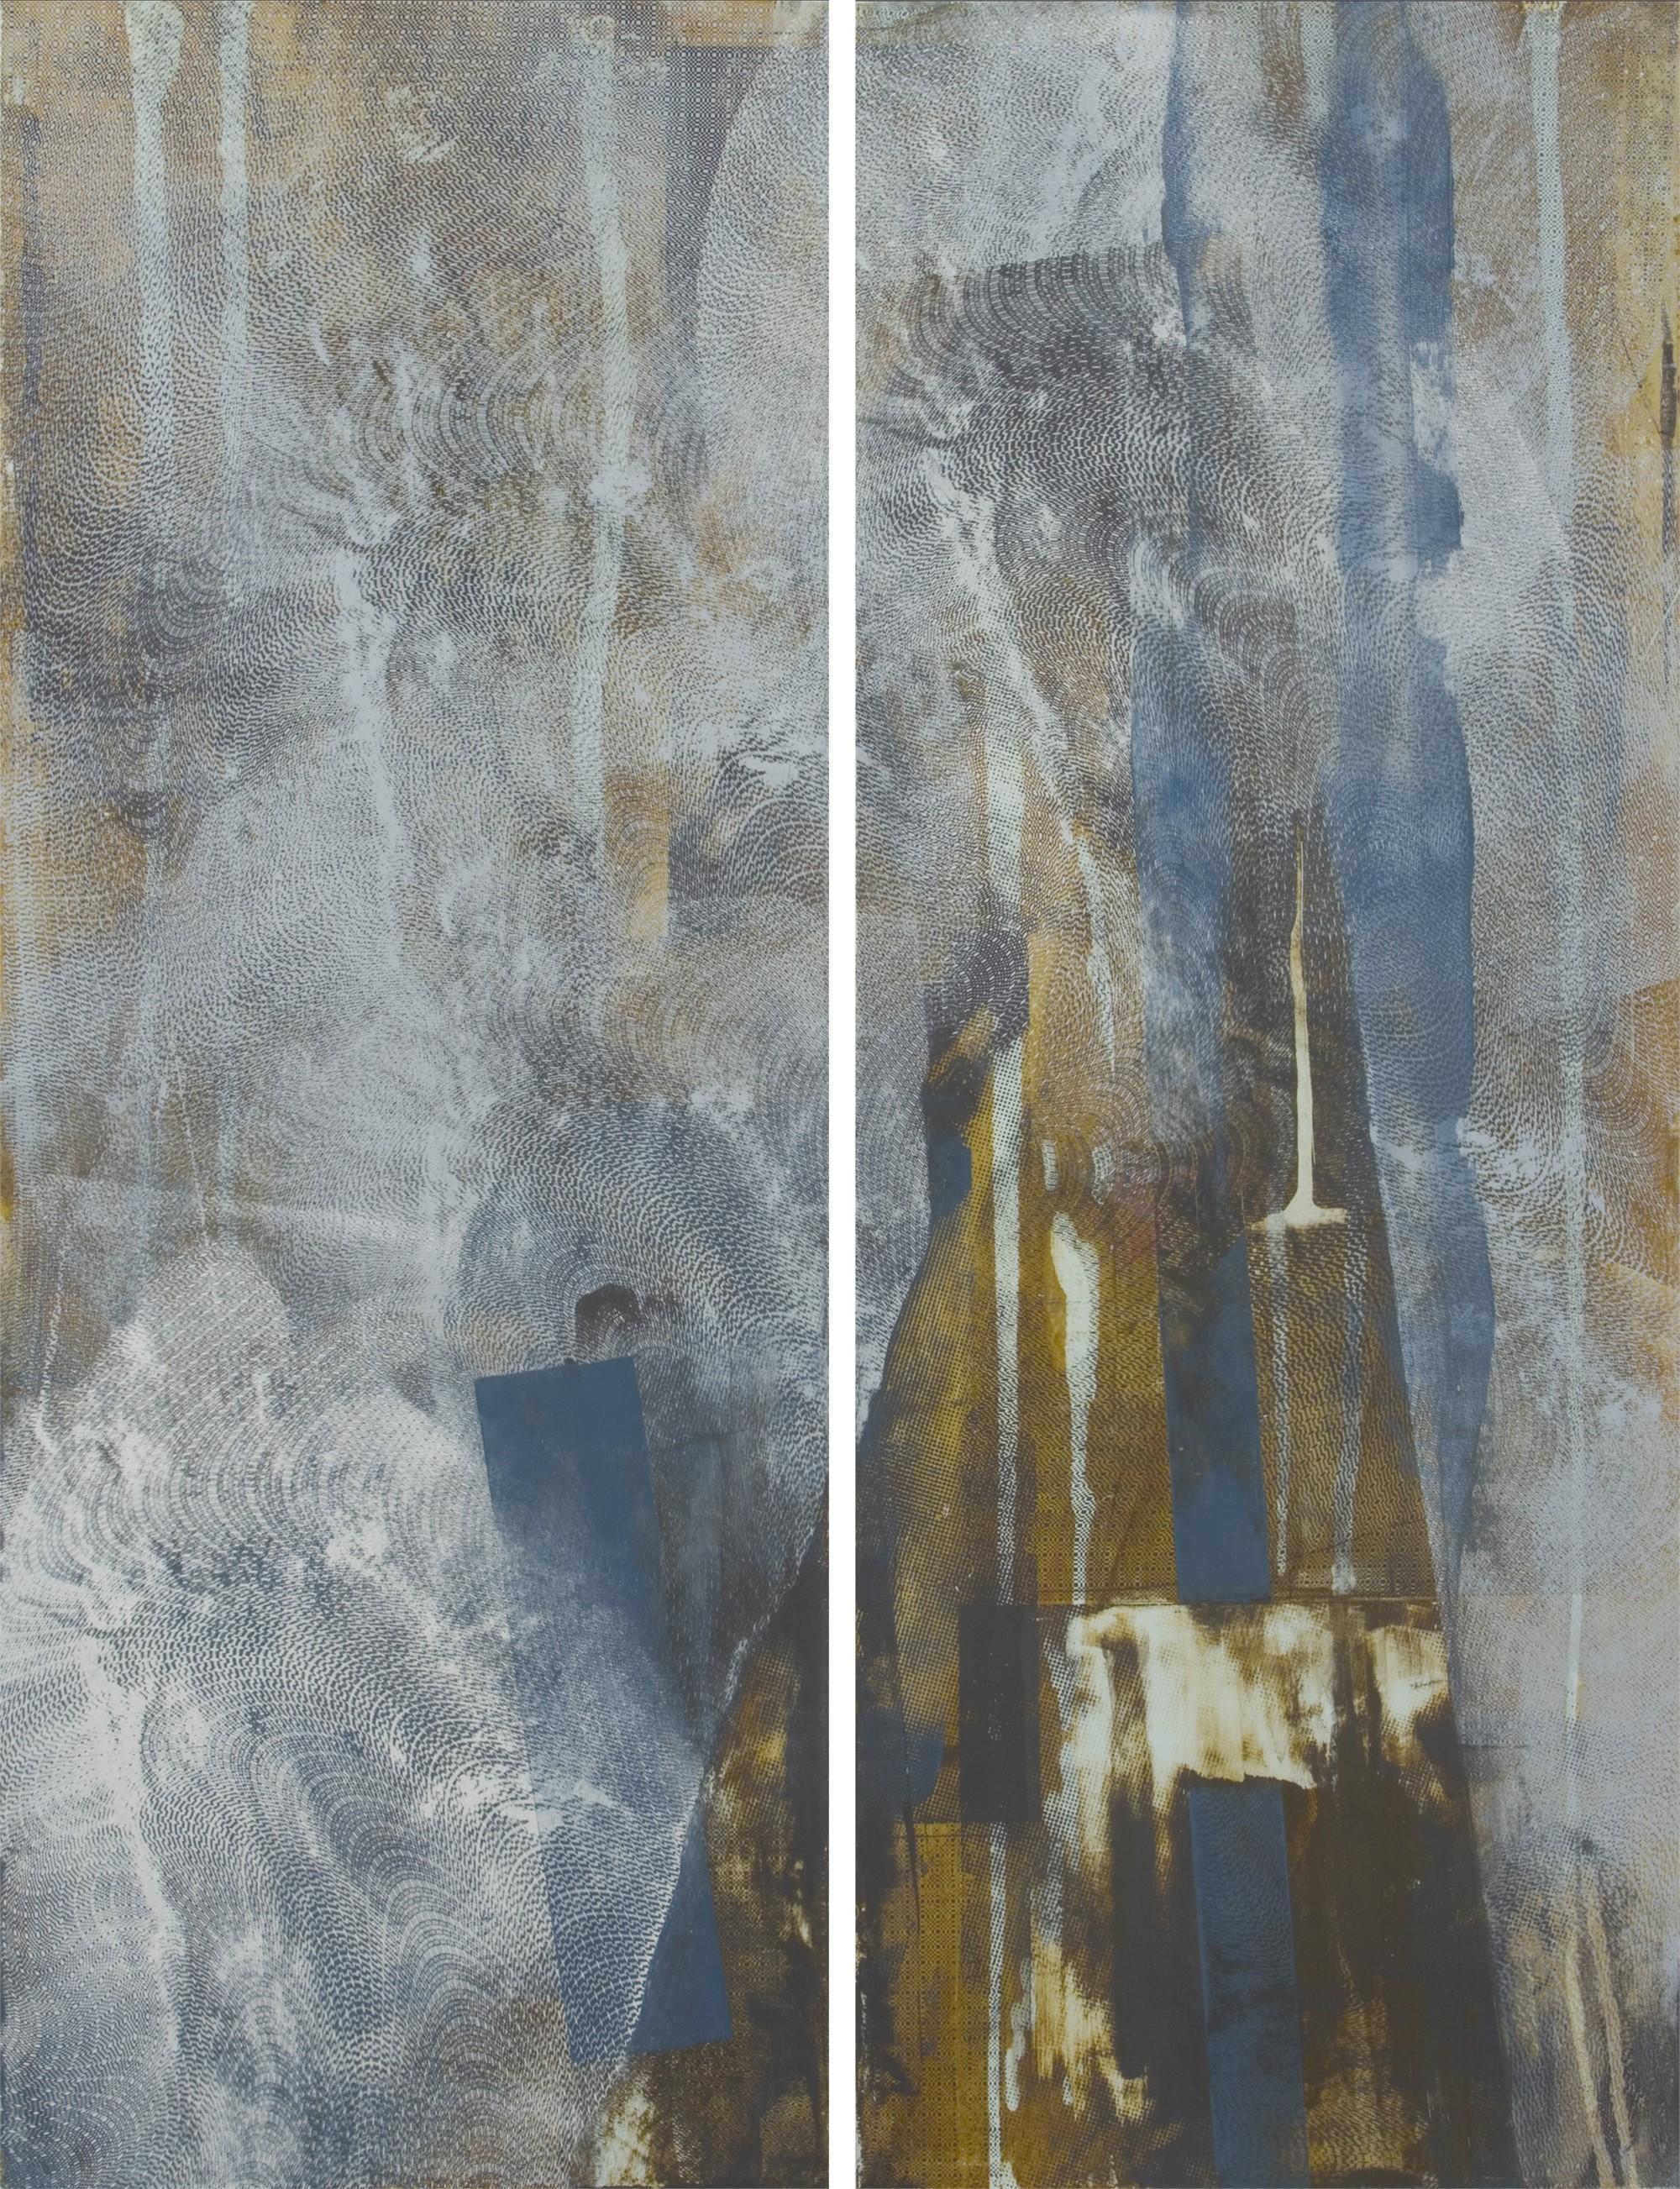 Entangled 3 by Dorothea Van Camp